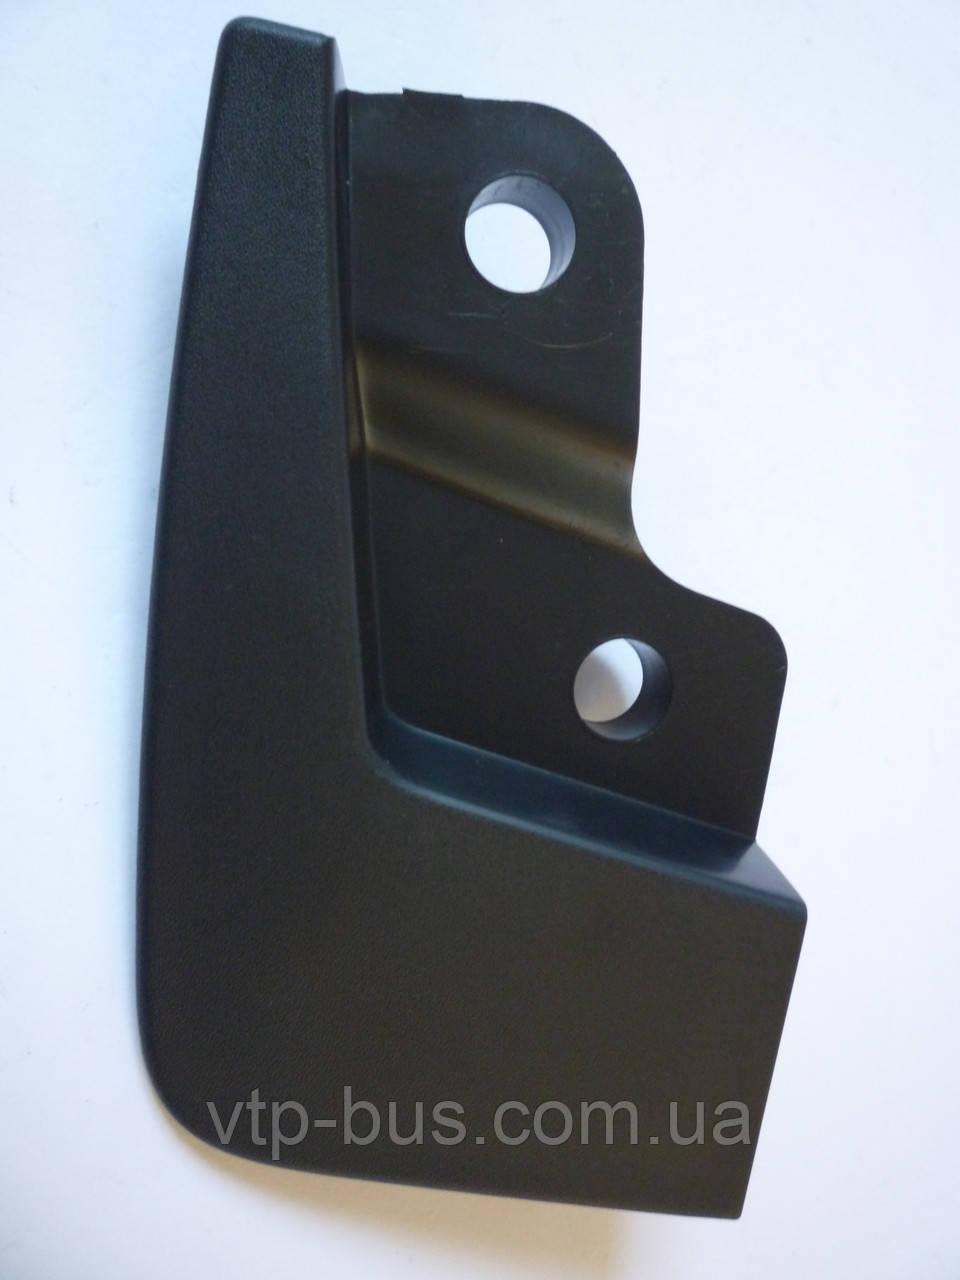 Брызговик передний, правый на Renault Trafic / Opel Vivaro с 2001... Renault (оригинал), 8200091702